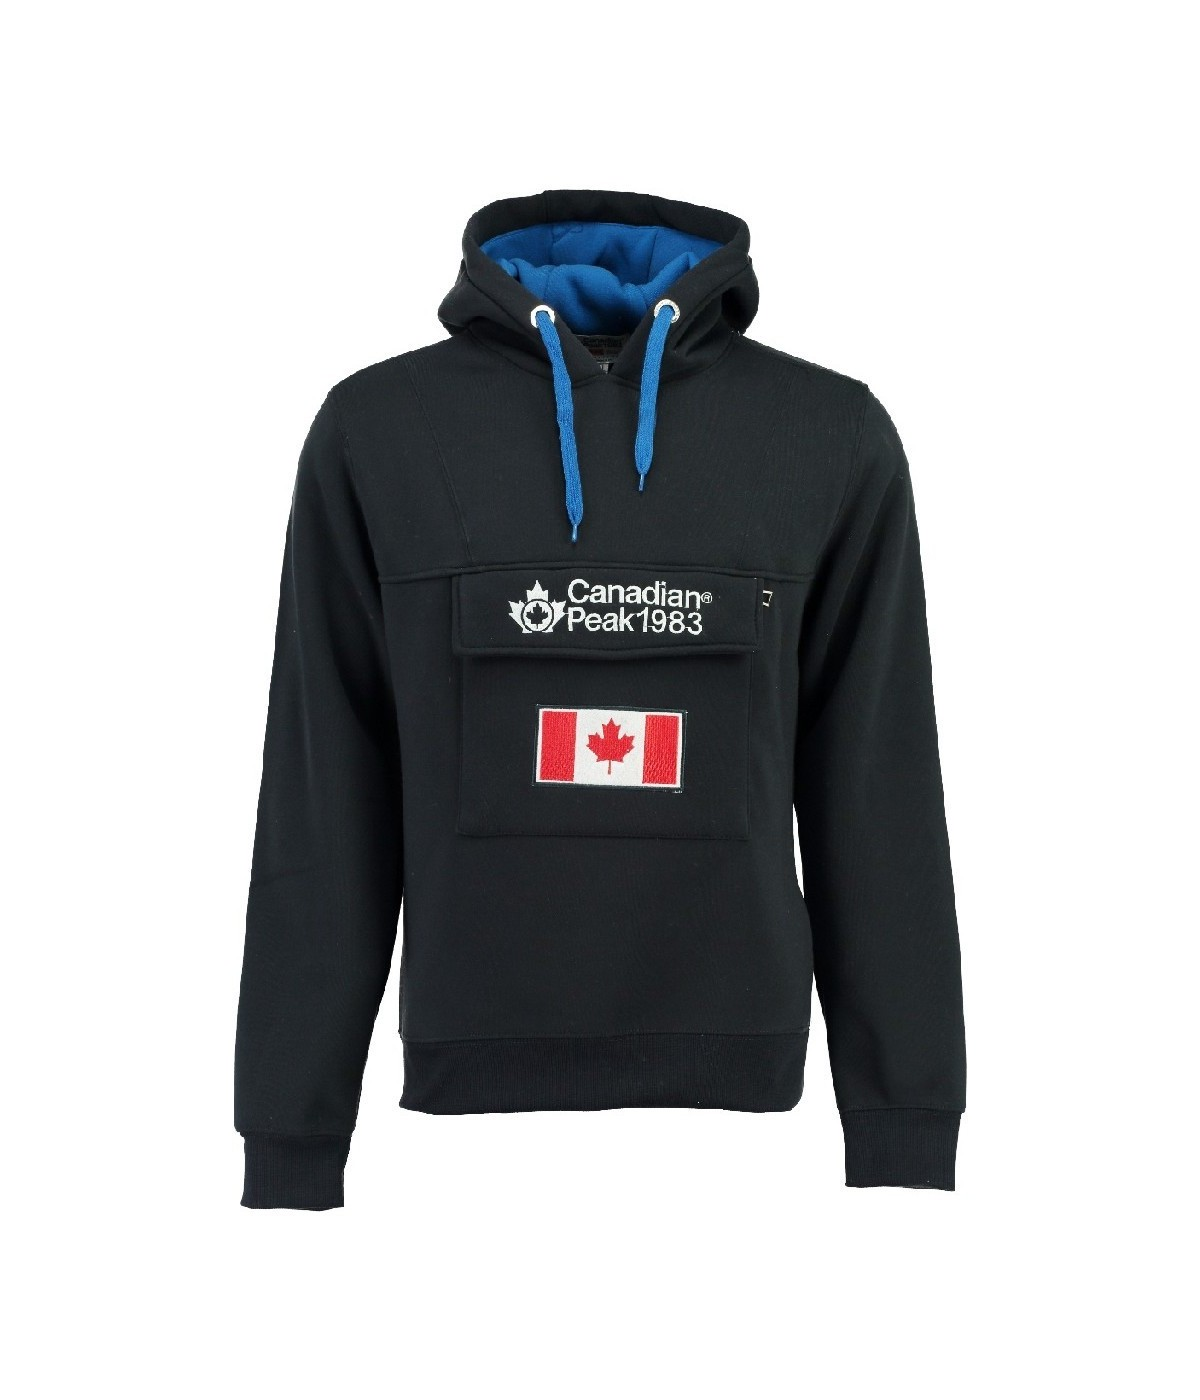 sweat homme canadian peak gadreak marine showroomvip. Black Bedroom Furniture Sets. Home Design Ideas